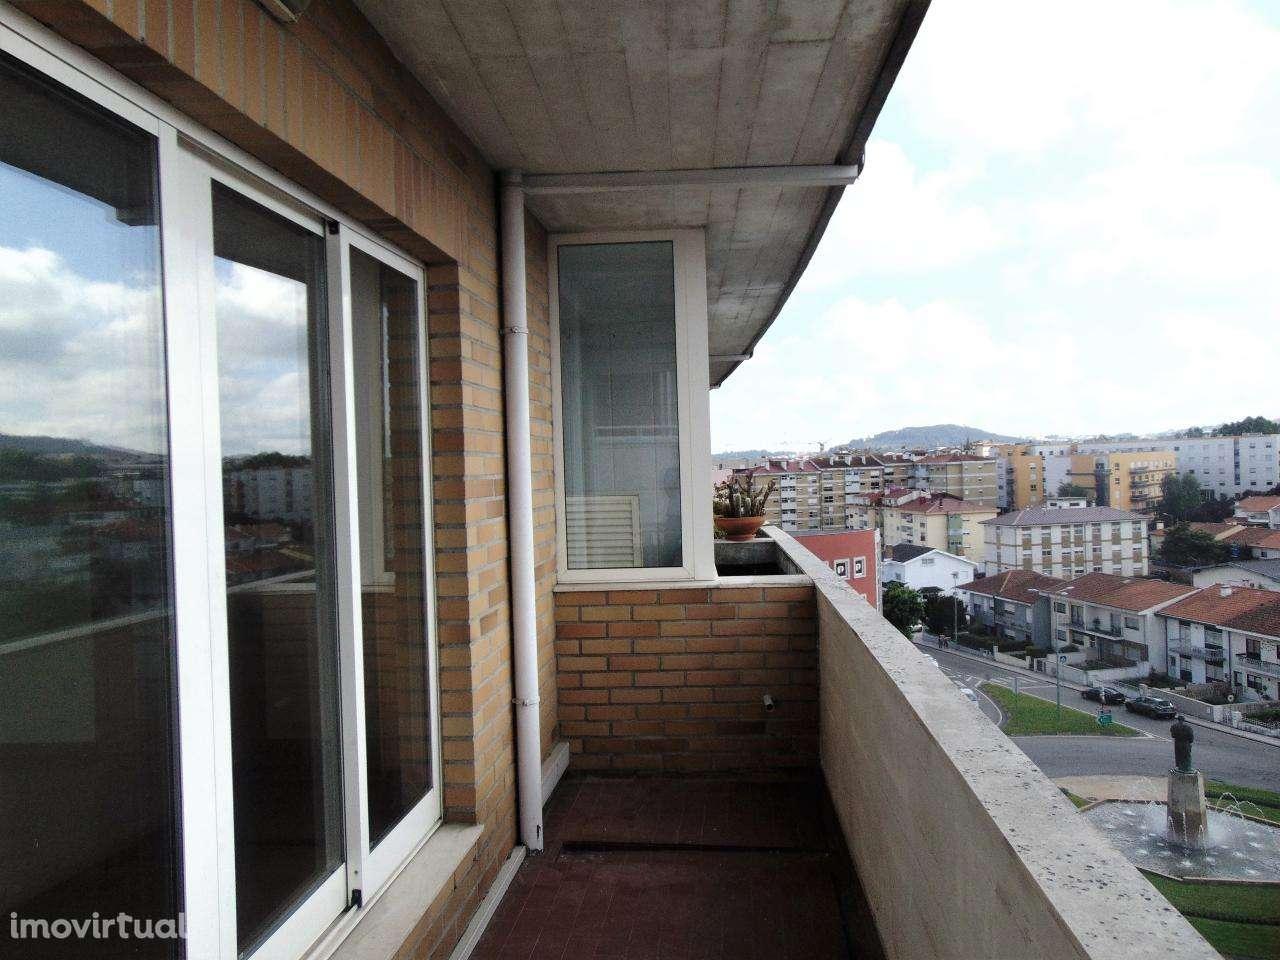 Apartamento para comprar, Vila Nova de Famalicão e Calendário, Vila Nova de Famalicão, Braga - Foto 11